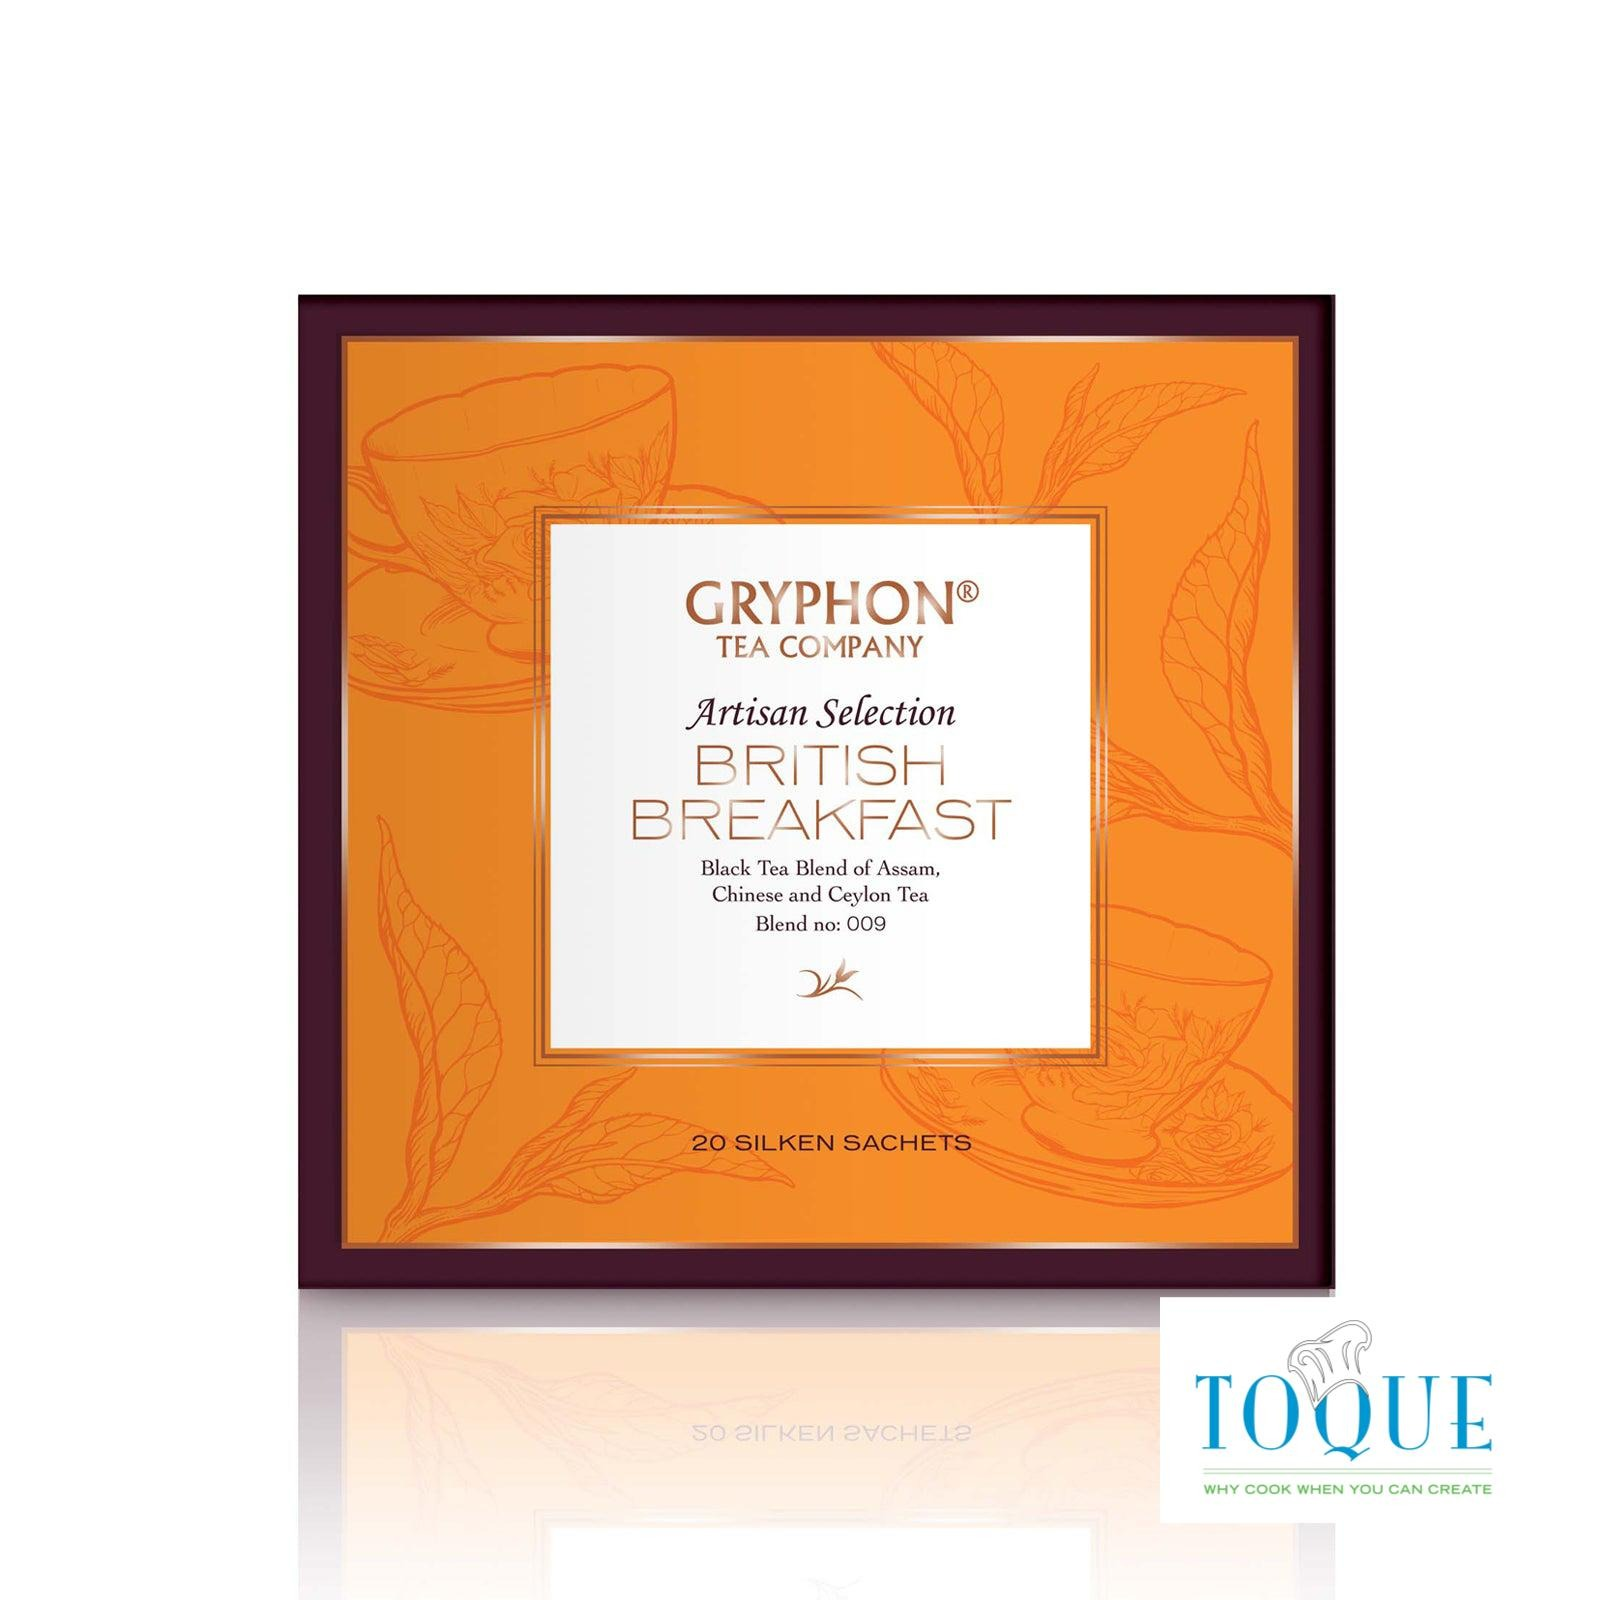 Gryphon British Breakfast Tea